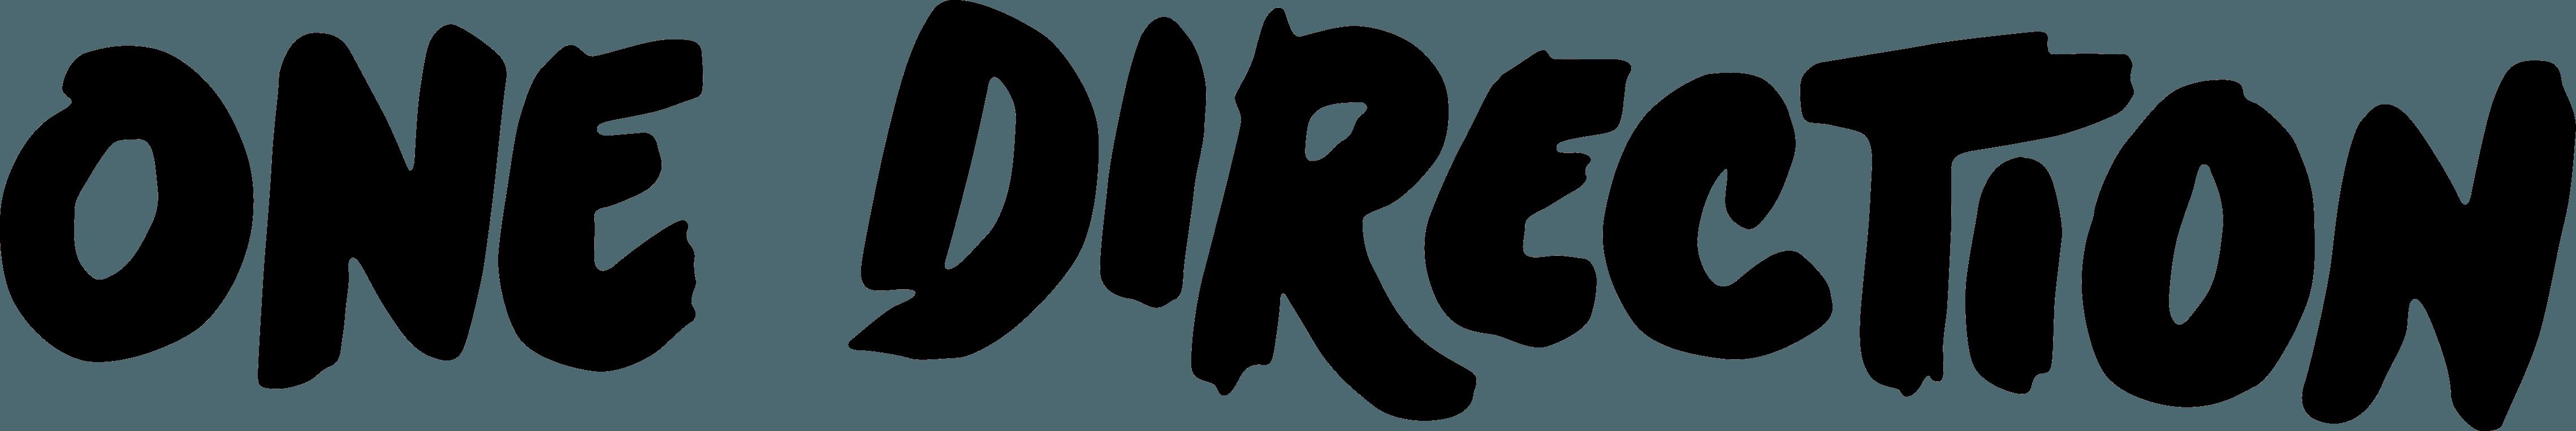 One direction flag logo